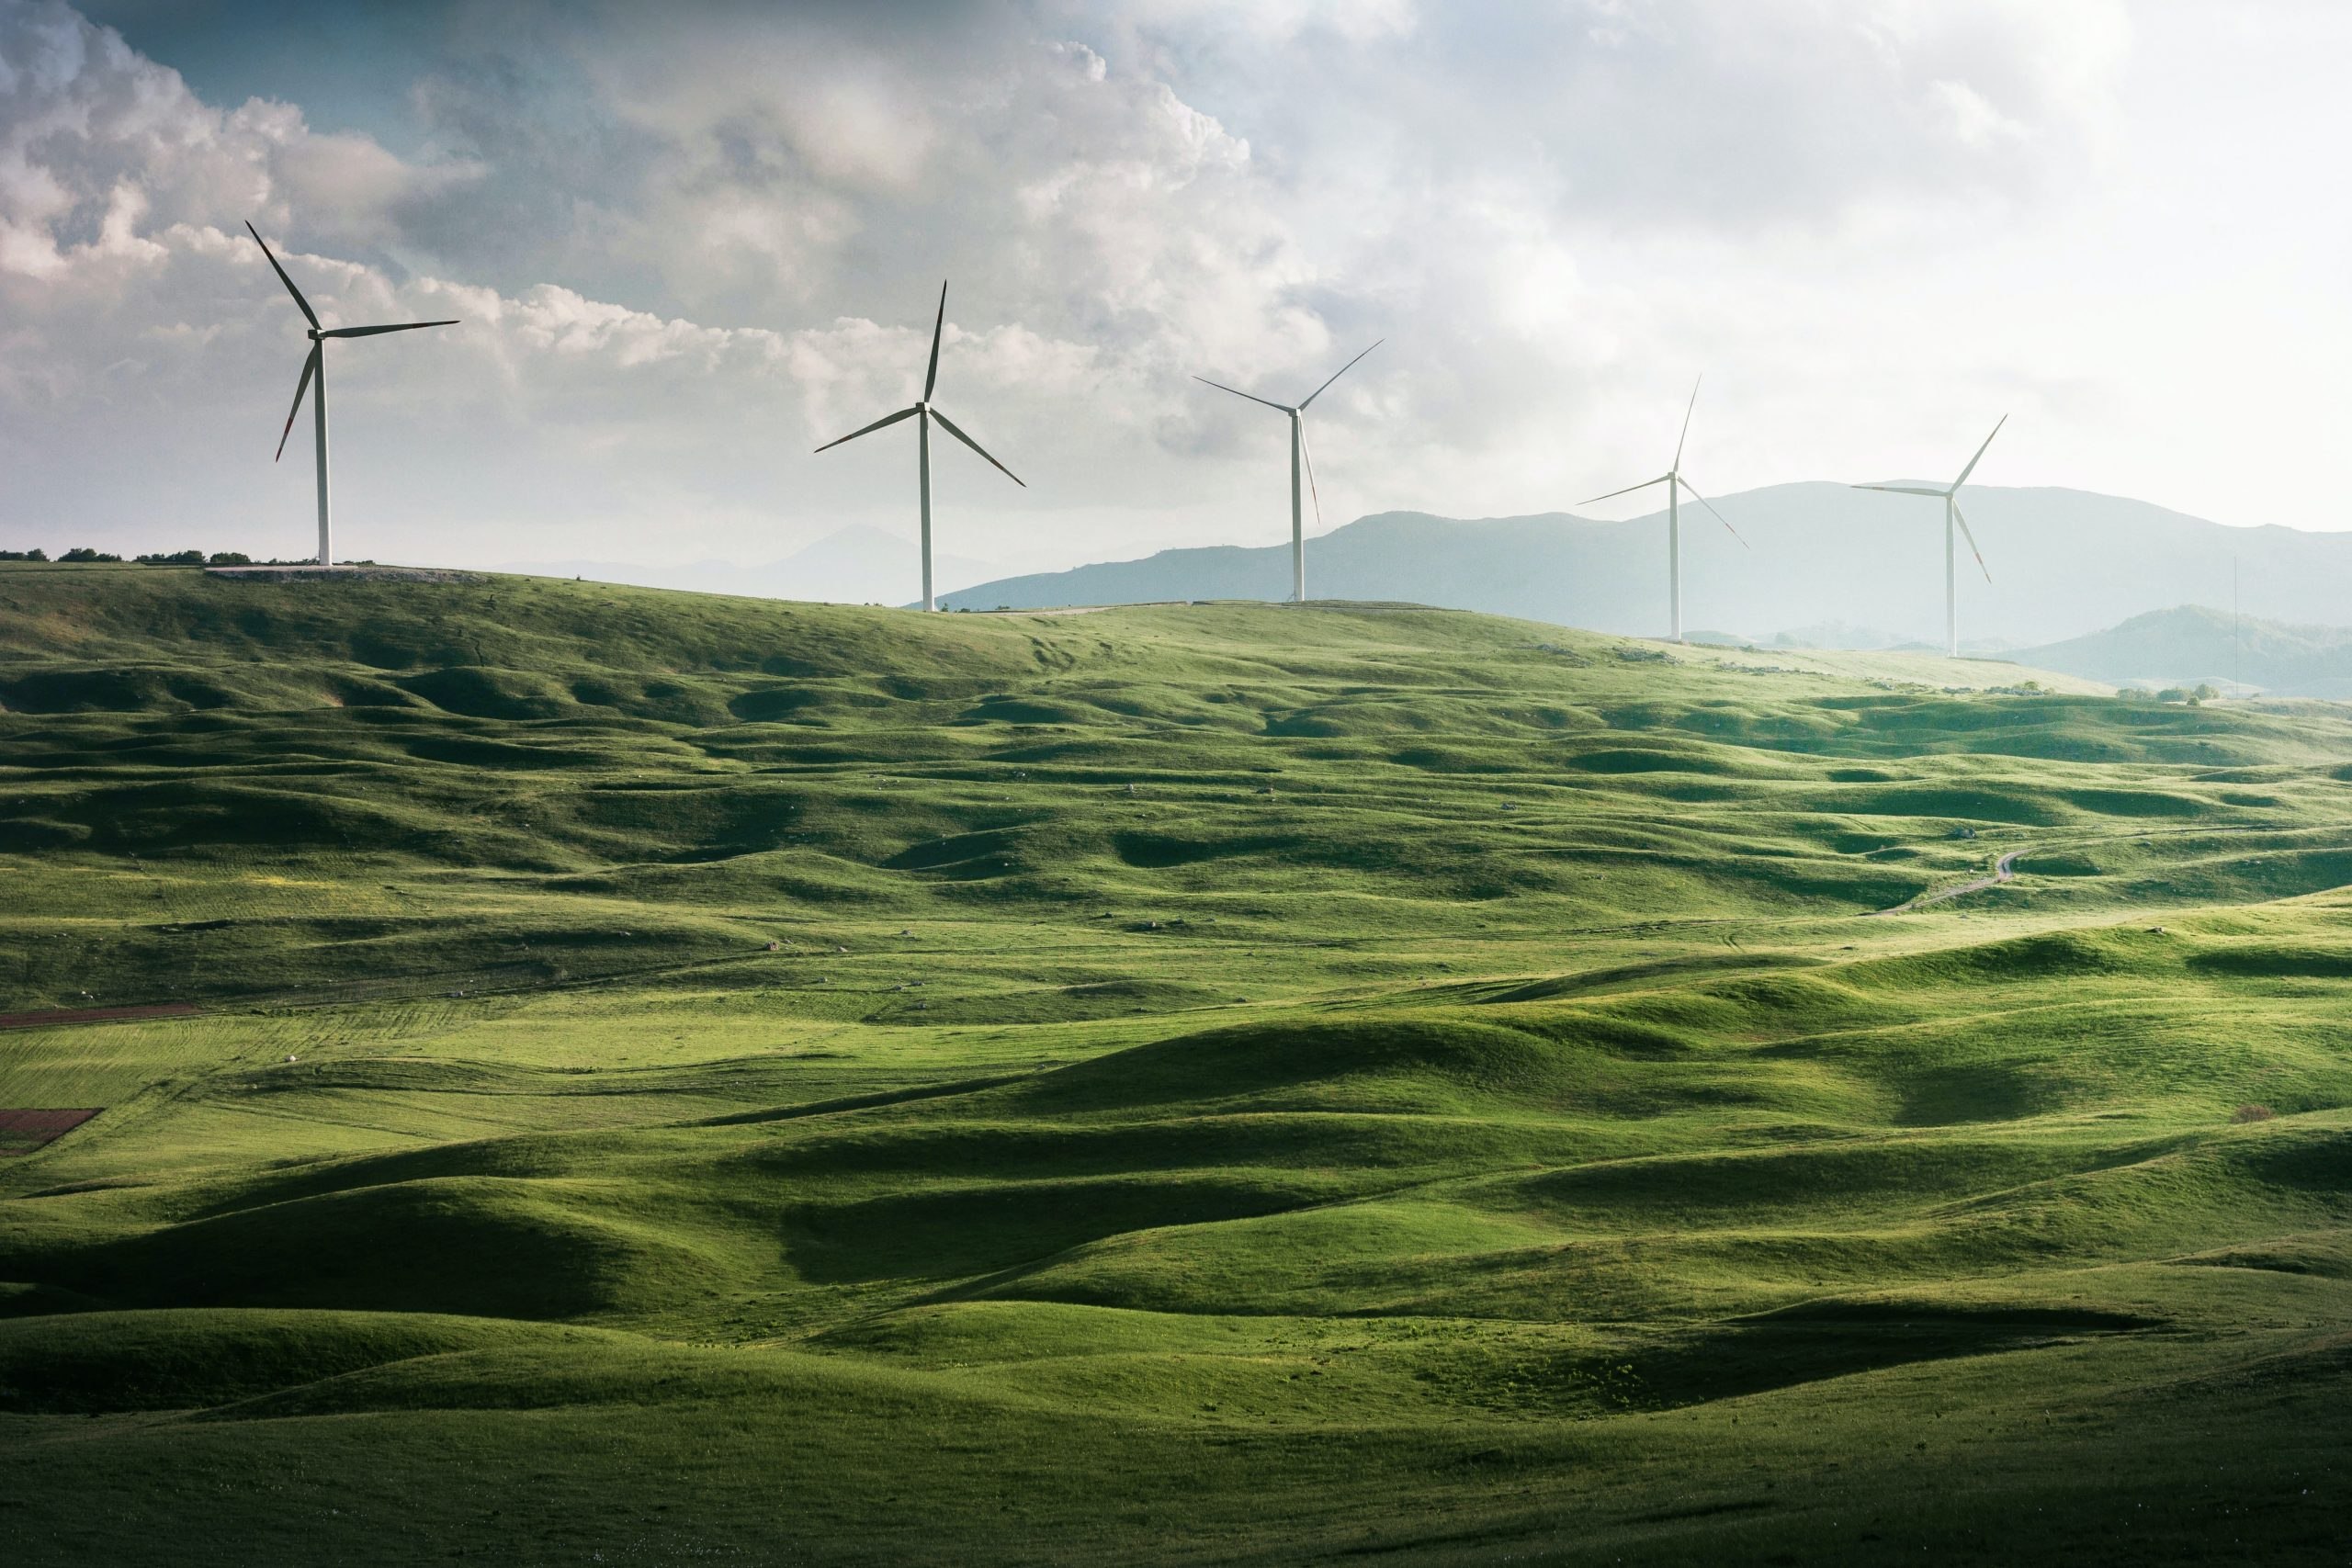 AleaSoft - parque eolico